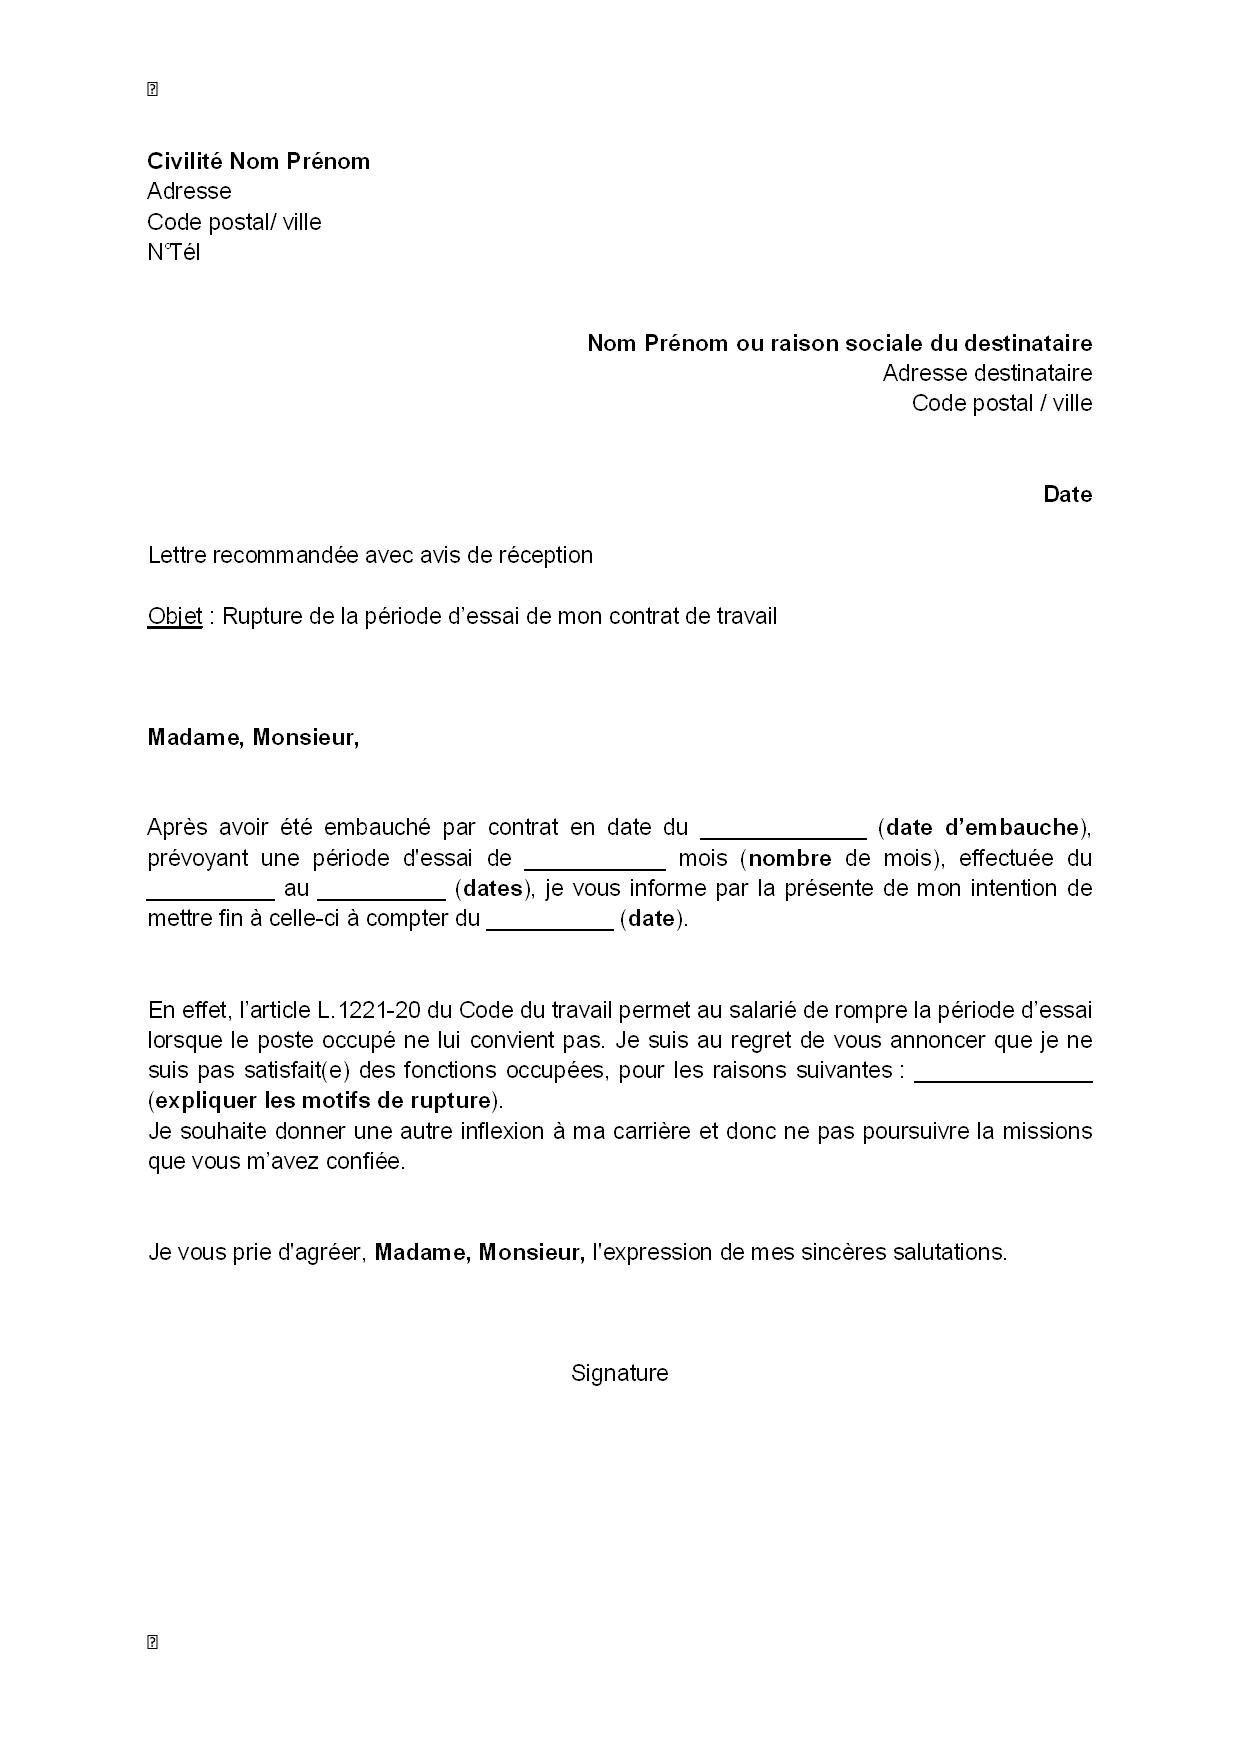 exemple gratuit de lettre rupture p u00e9riode essai par salari u00e9